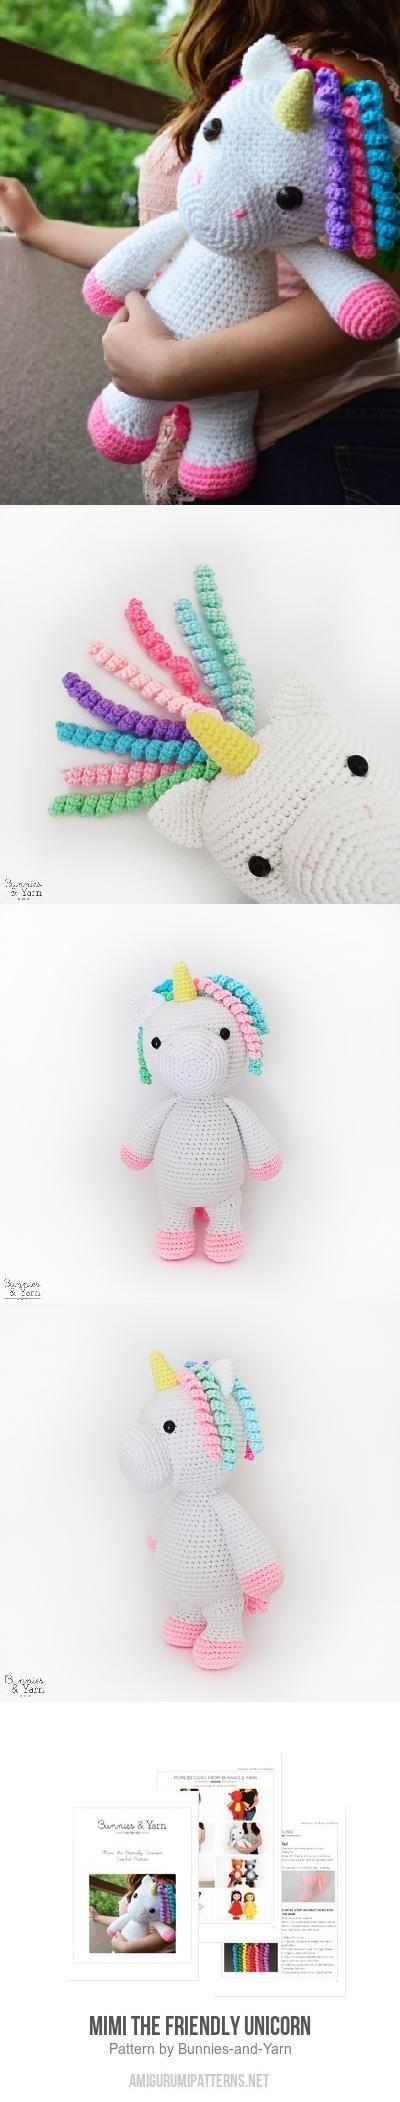 Mimi the Friendly Unicorn amigurumi pattern   Pines   Pinterest ...